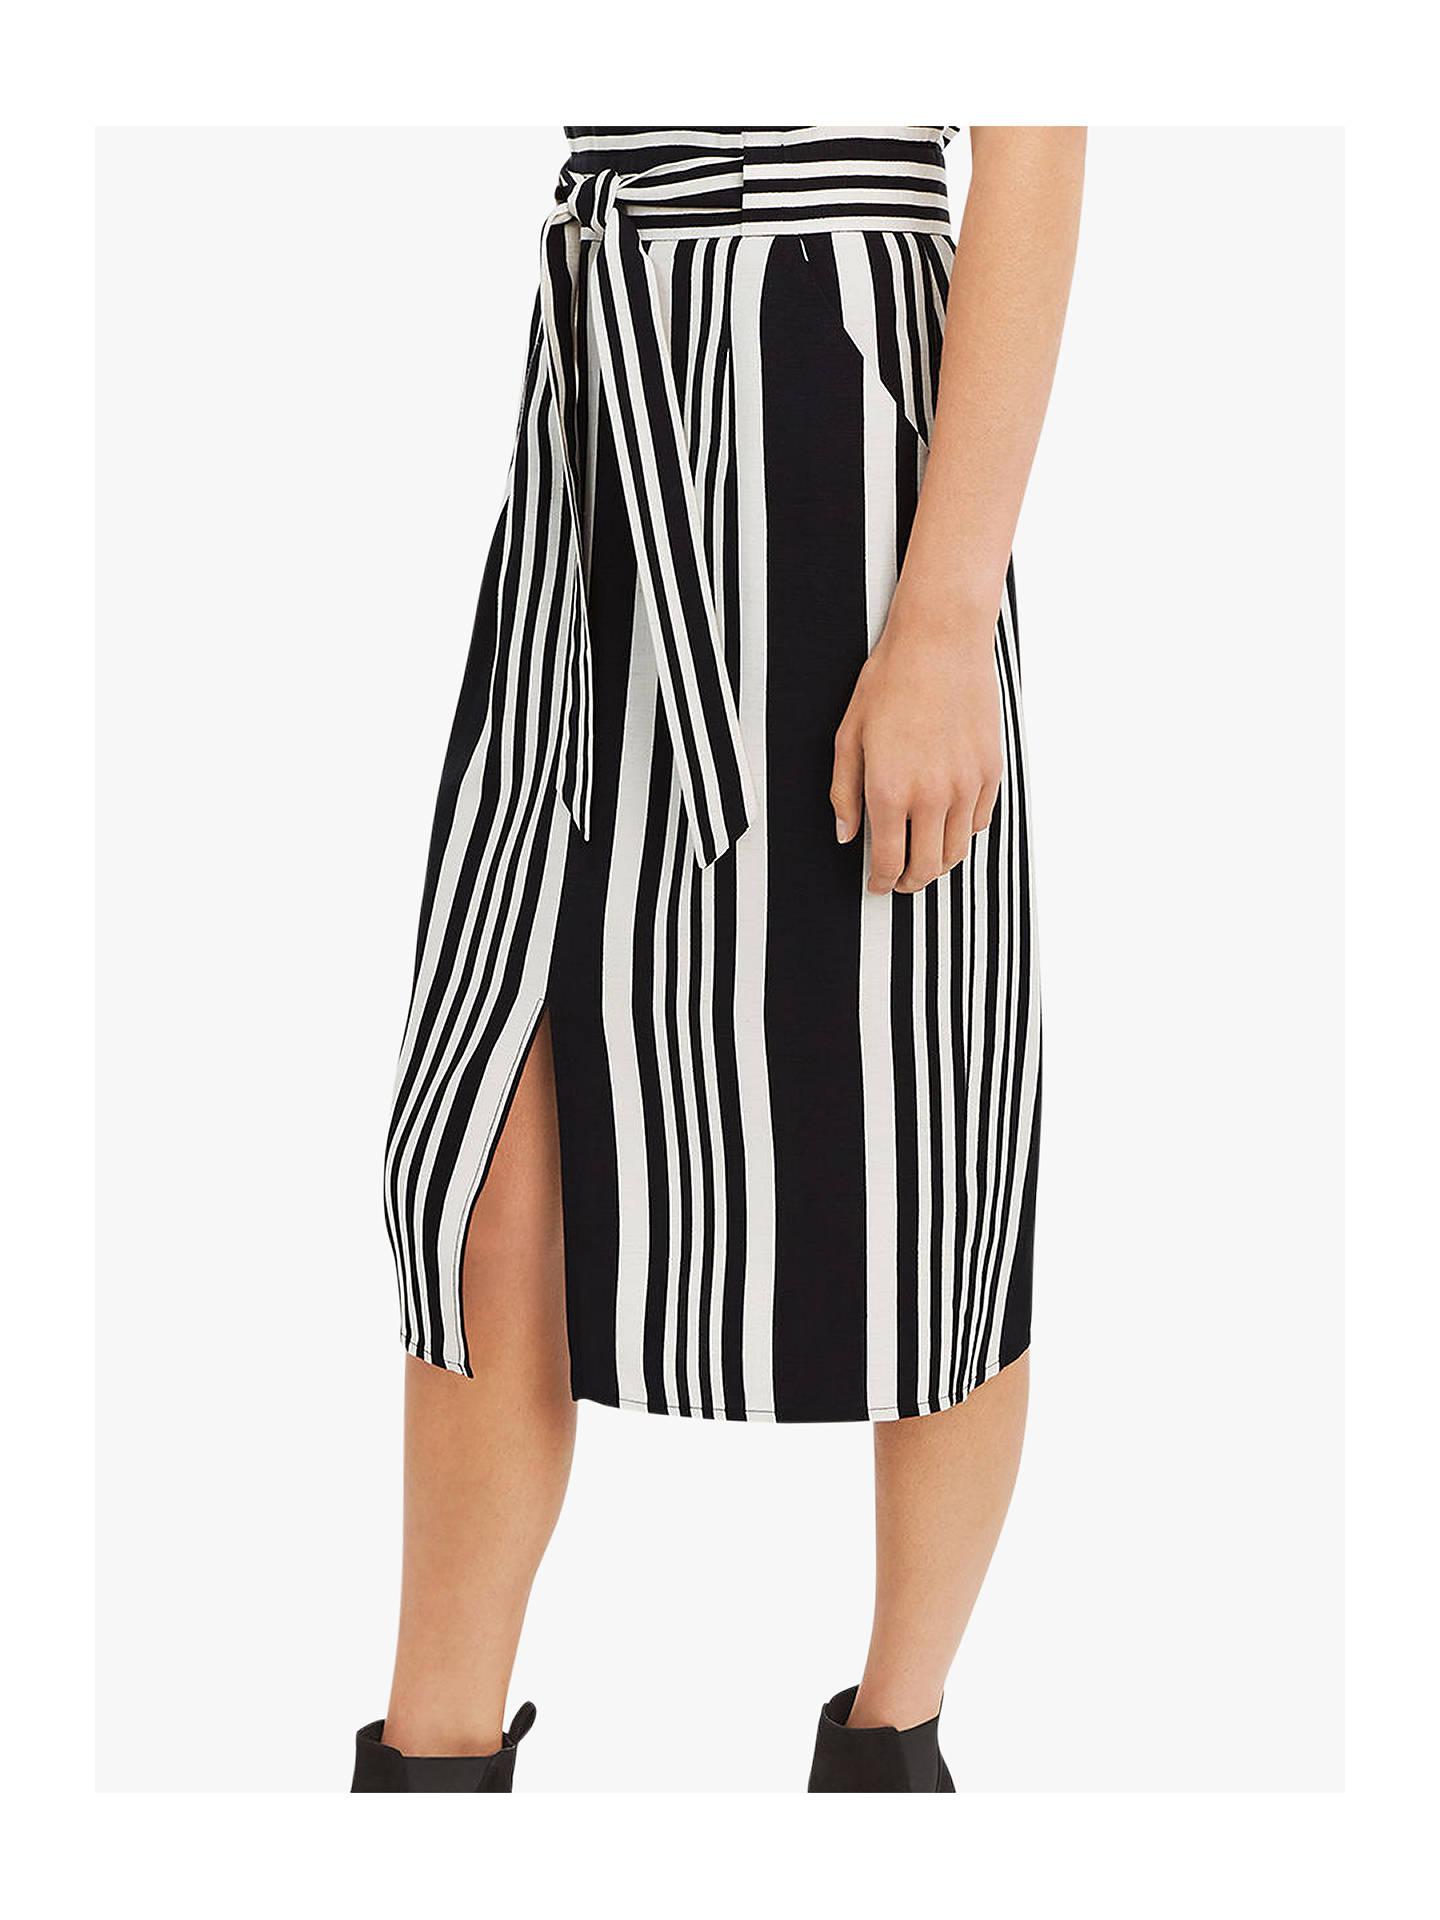 49c46bdbb6 ... Buy Oasis Stripe Pencil Skirt, Black/White, 14 Online at johnlewis.com